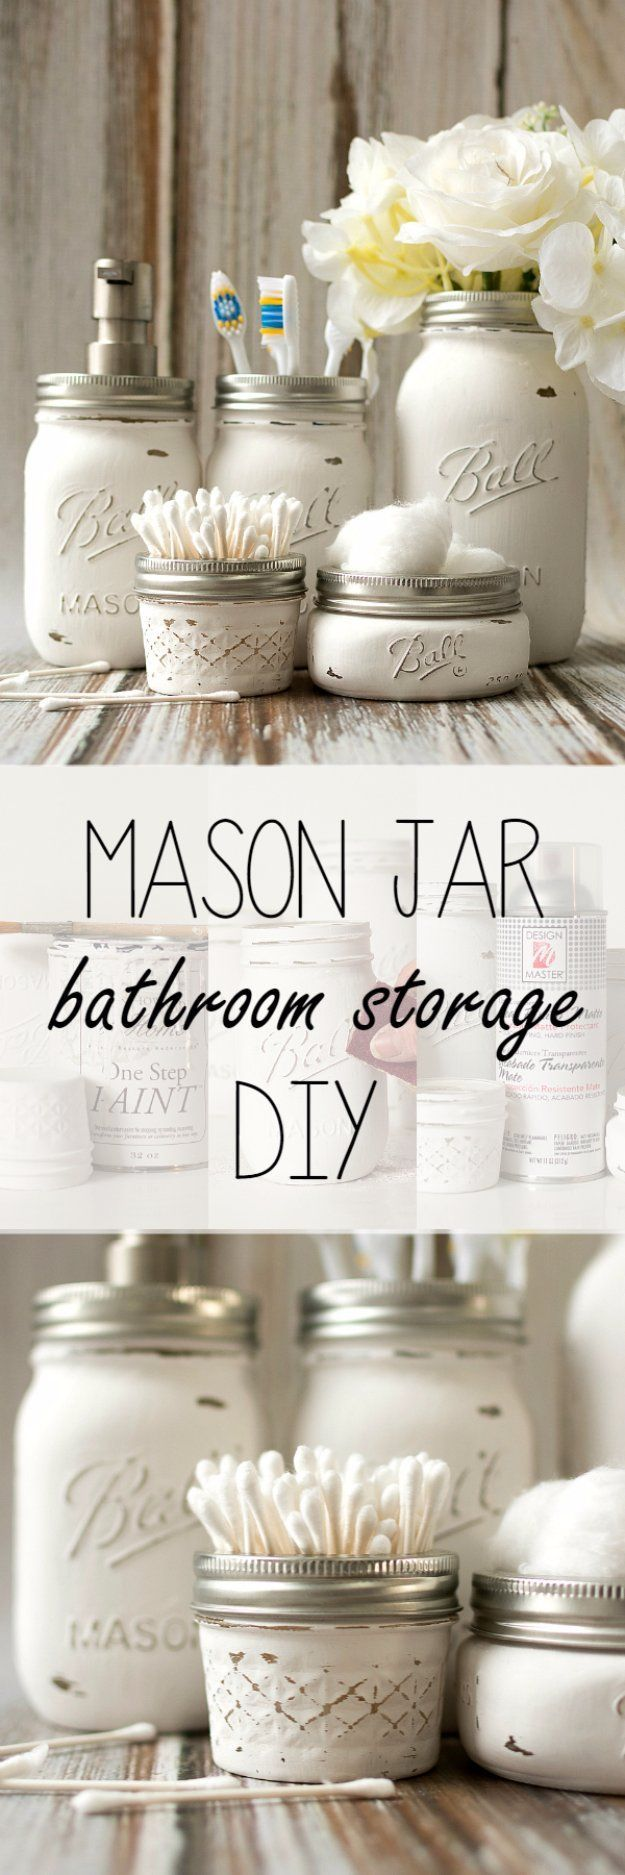 DIY Bathroom Decor Ideas - Mason Jar Bathroom Storage Accessories - Cool Do It Yourself Bath Ideas on A Budget, Rustic Bathroom Fixtures, Creative Wall Art, Rugs, Mason Jar Accessories and Easy Projects diyjoy.com/...